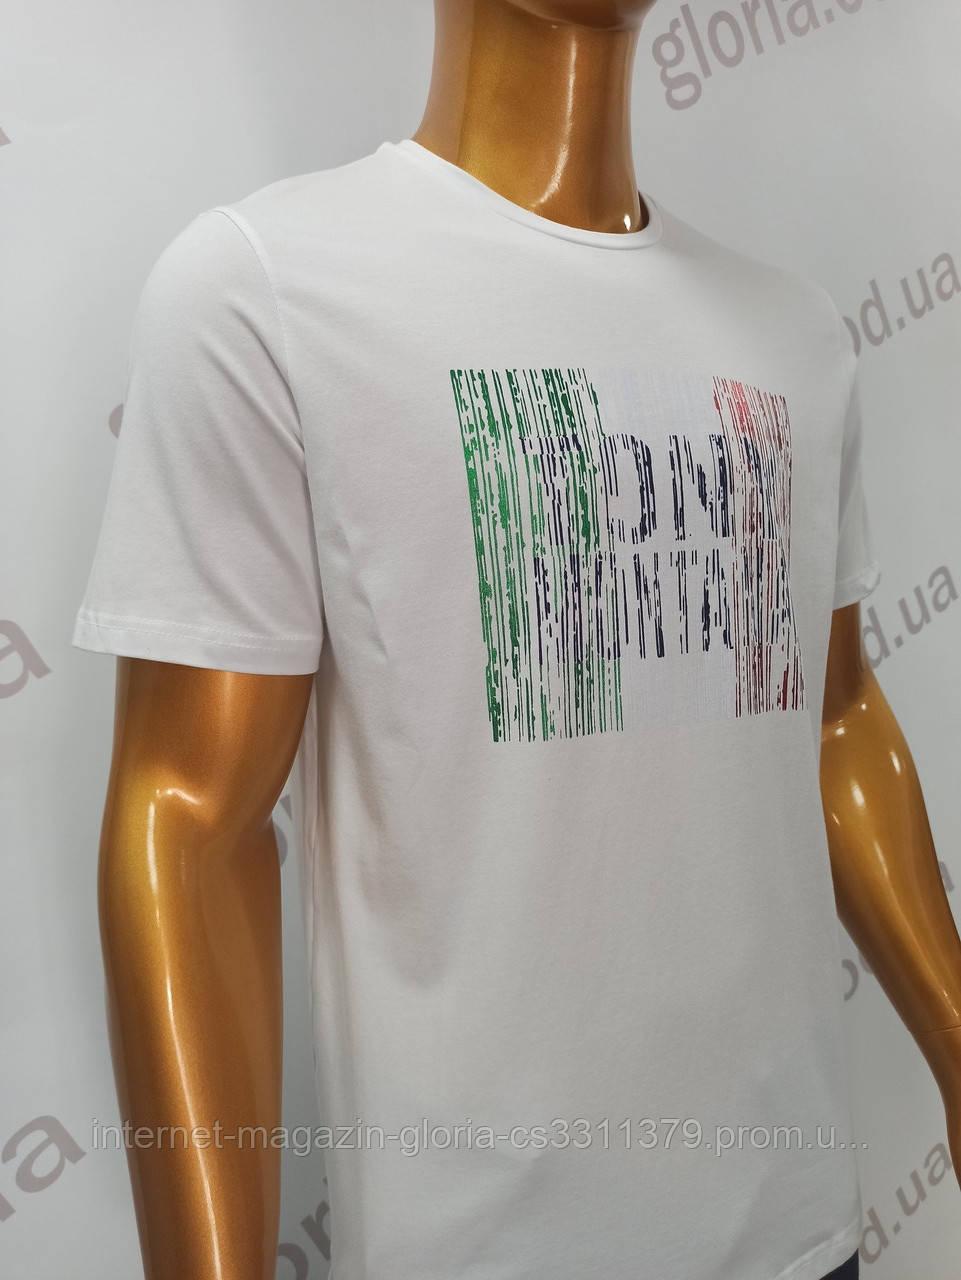 Мужская футболка Tony Montana. MSL-2062(be). Размеры: M,L,XL,XXL.